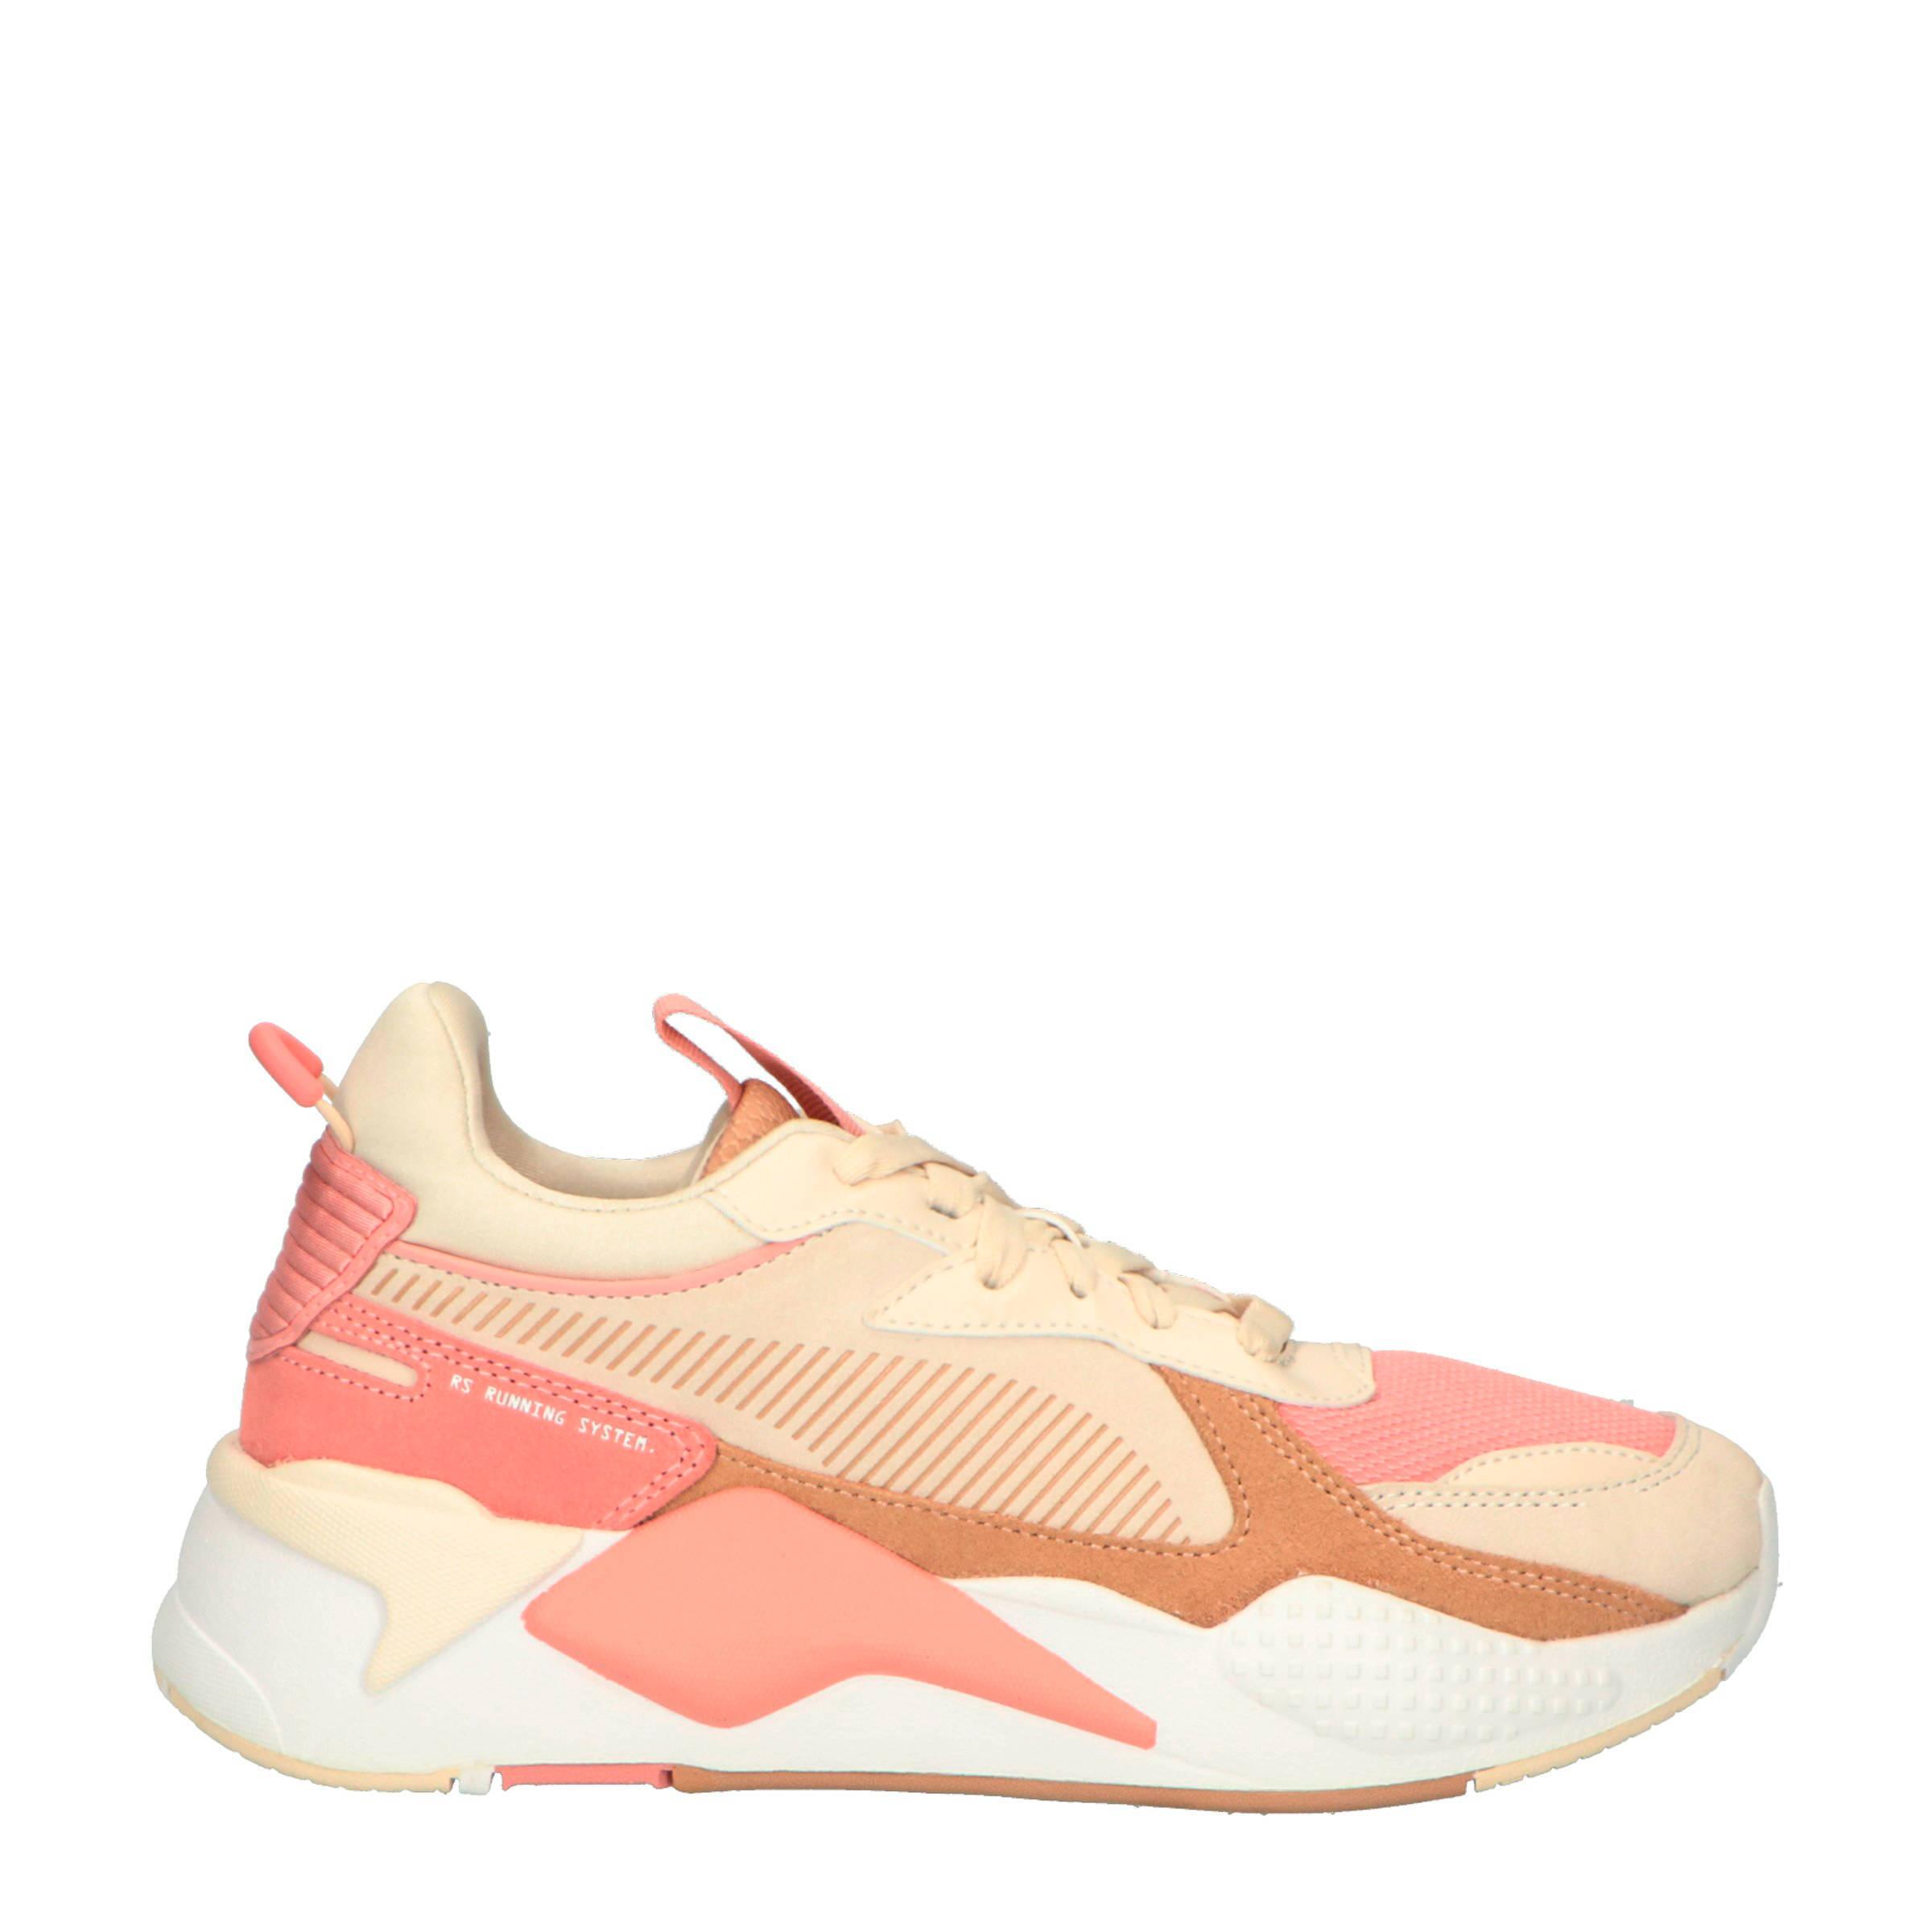 RS-X Reinvent sneakers roze/beige